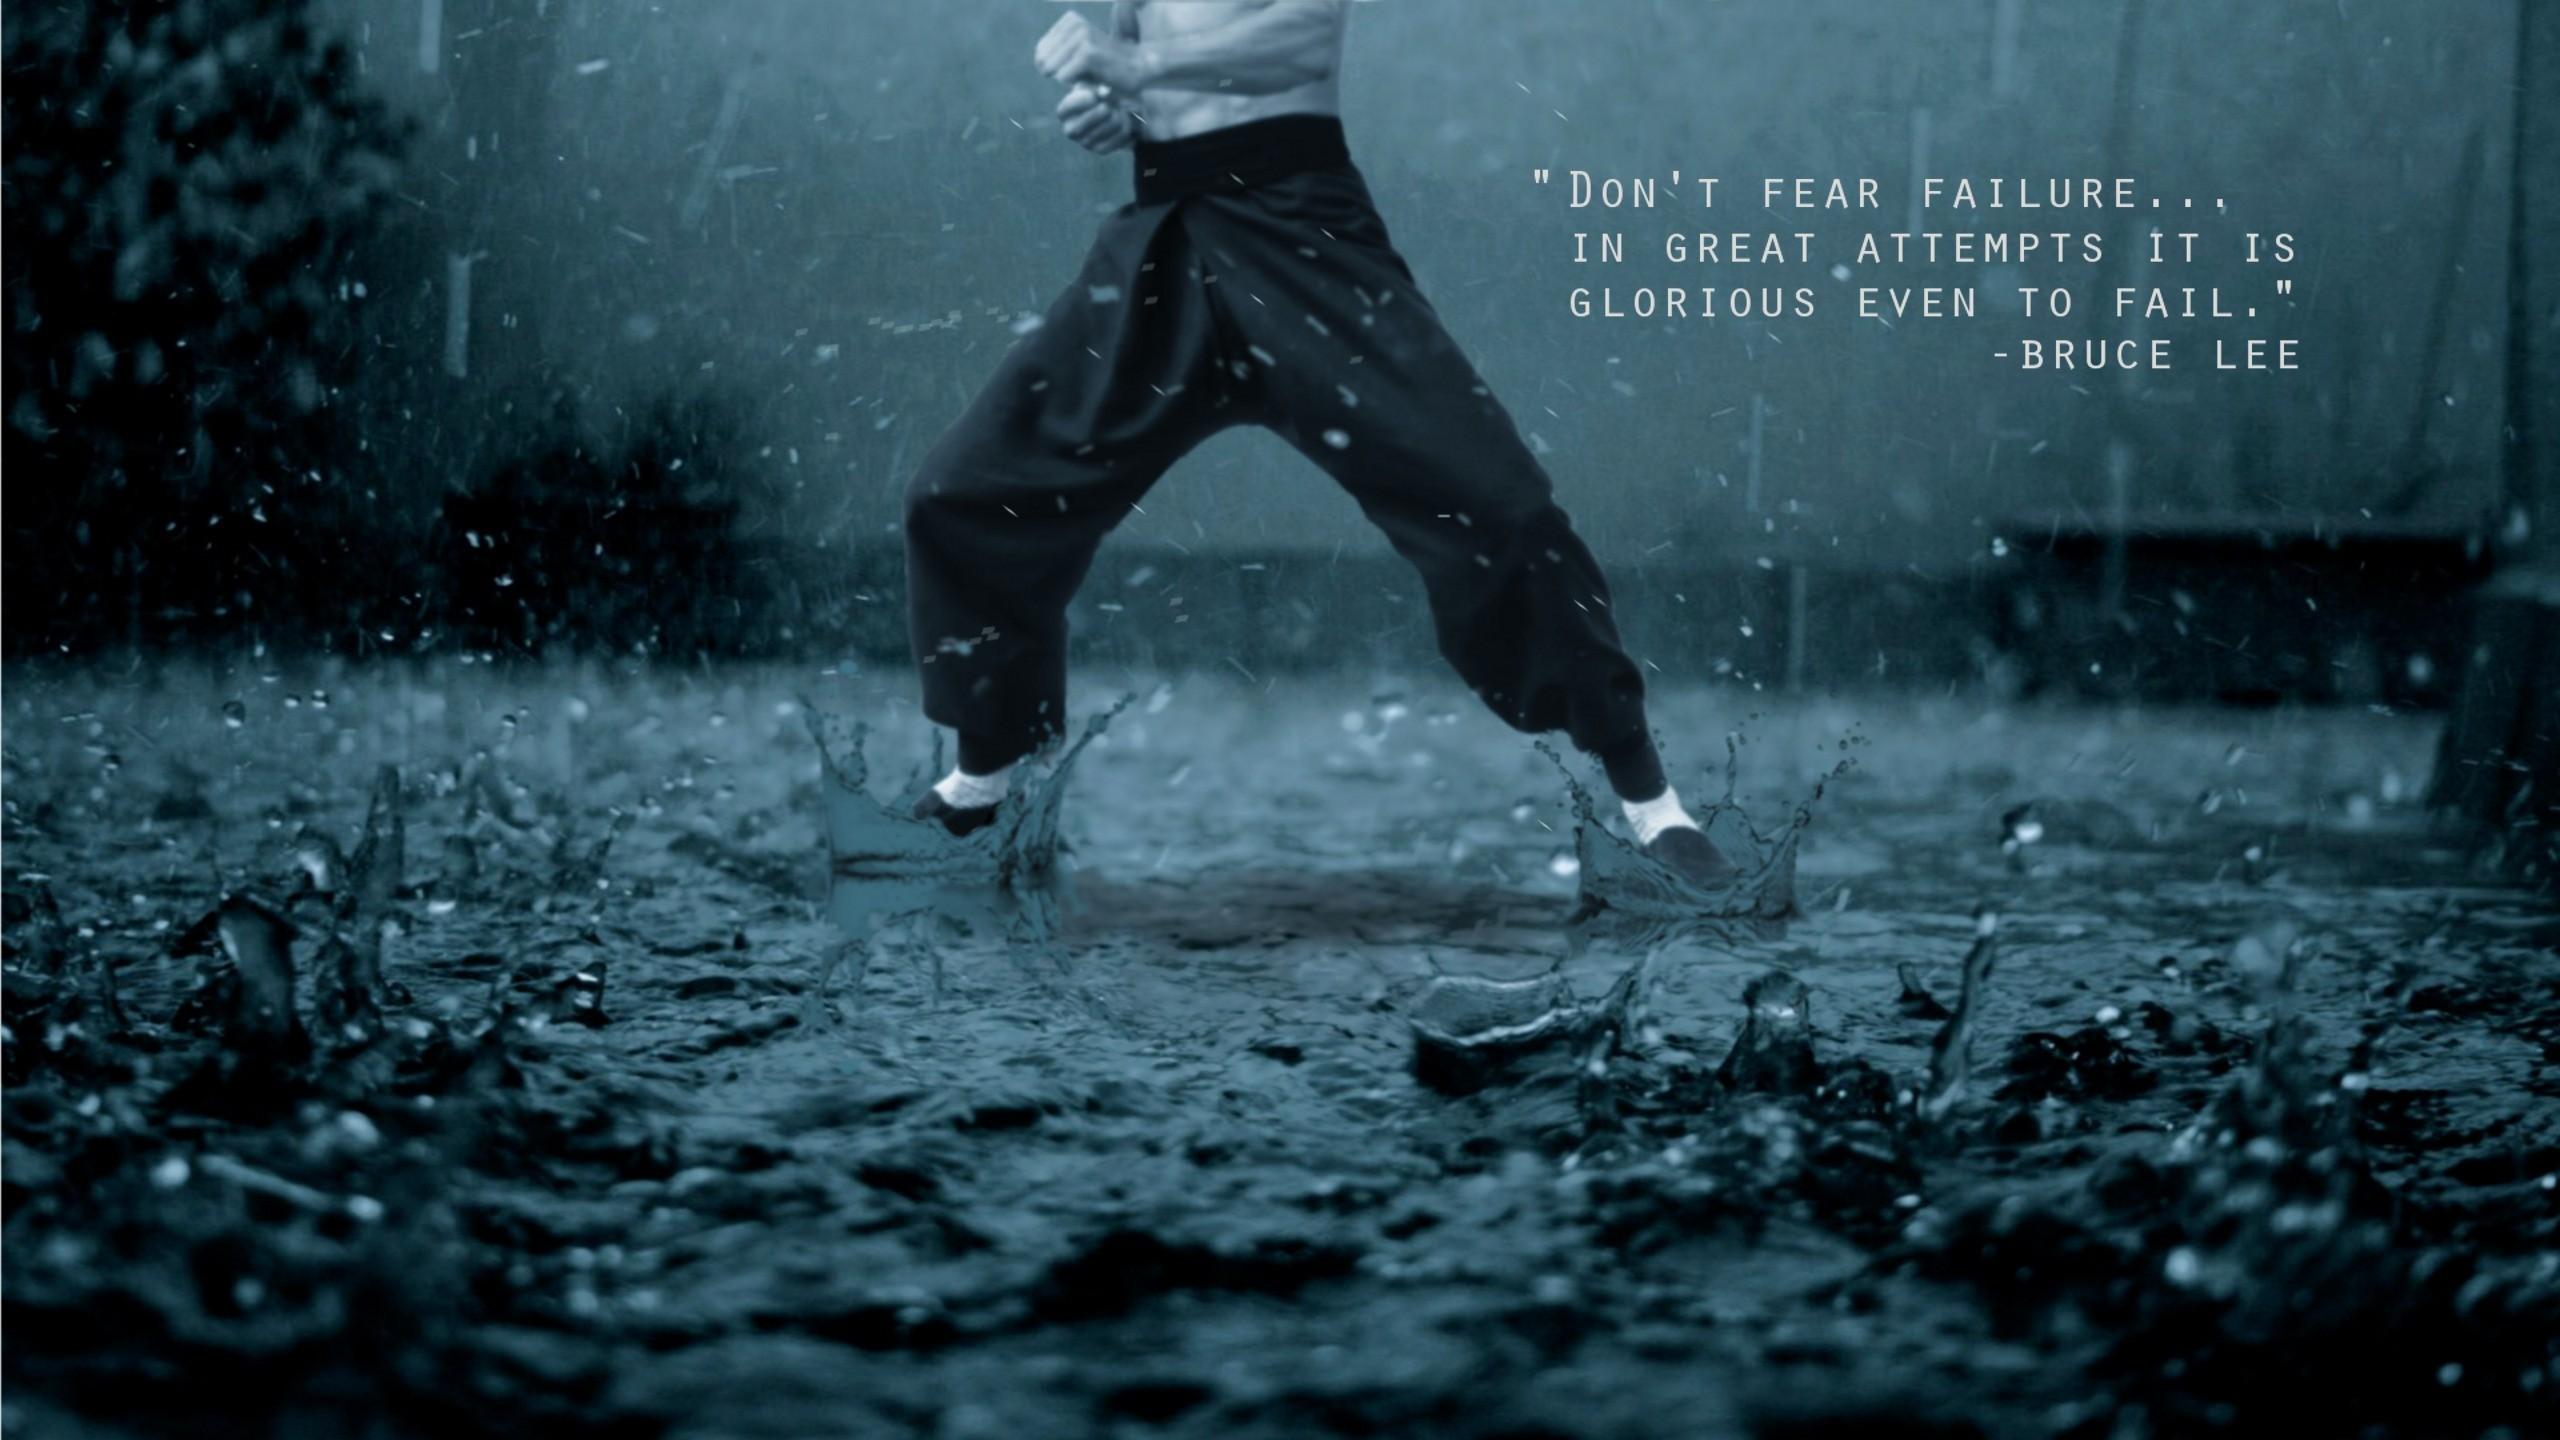 1080x1920 Bruce Lee IPhone 1080x1920 Wallpaper.